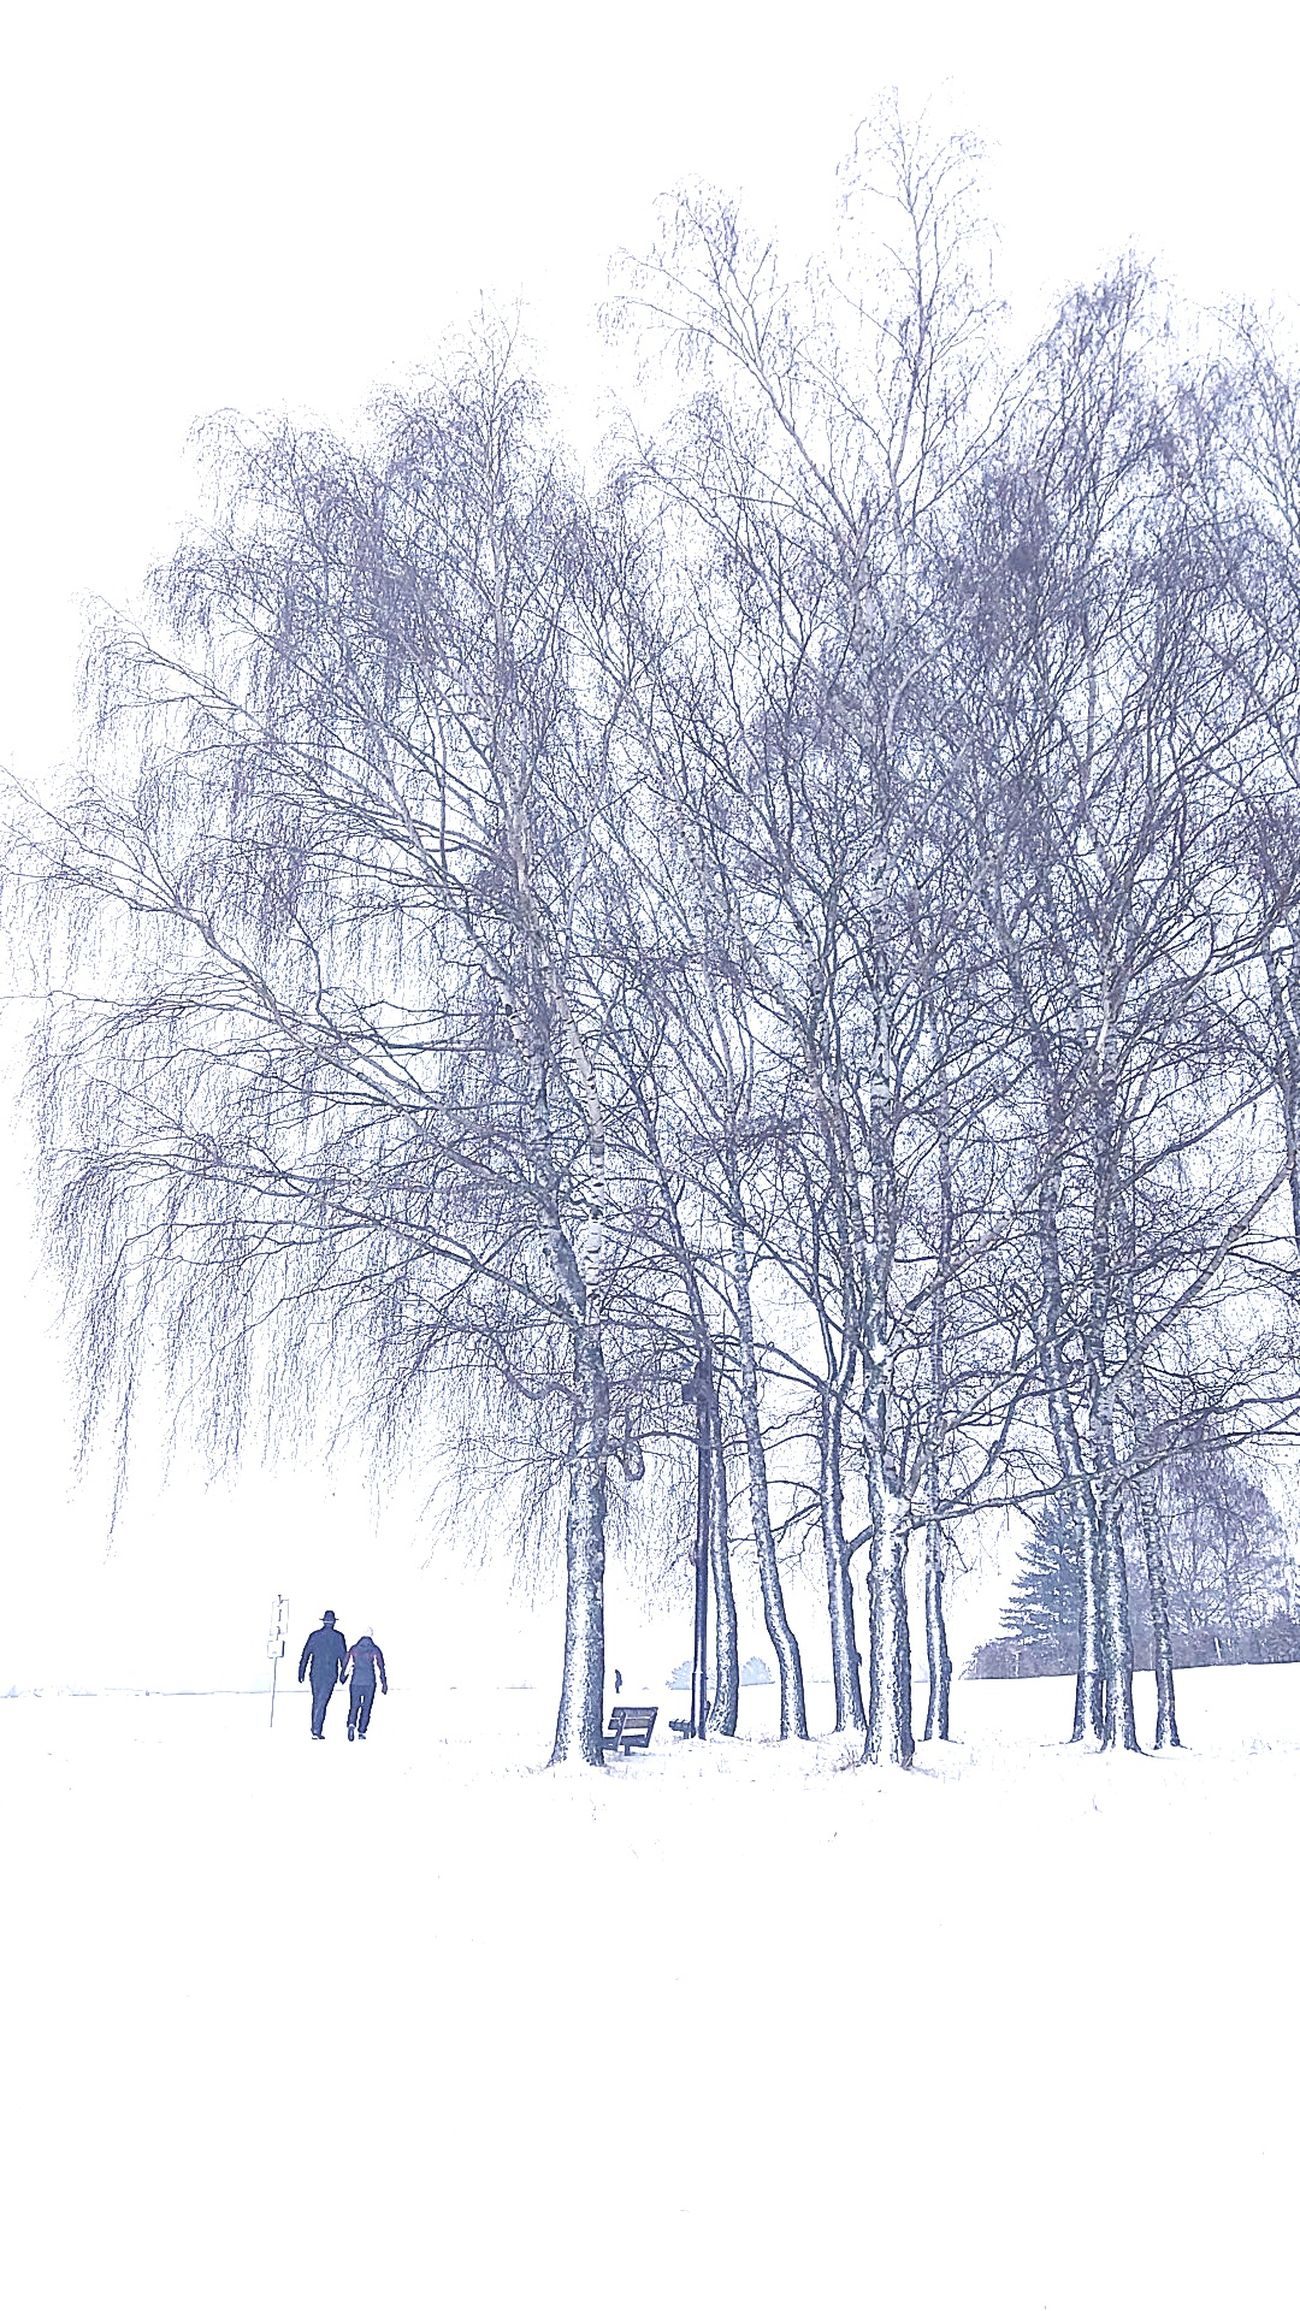 Winter Trees Winter Wonderland Walking Thru Nature